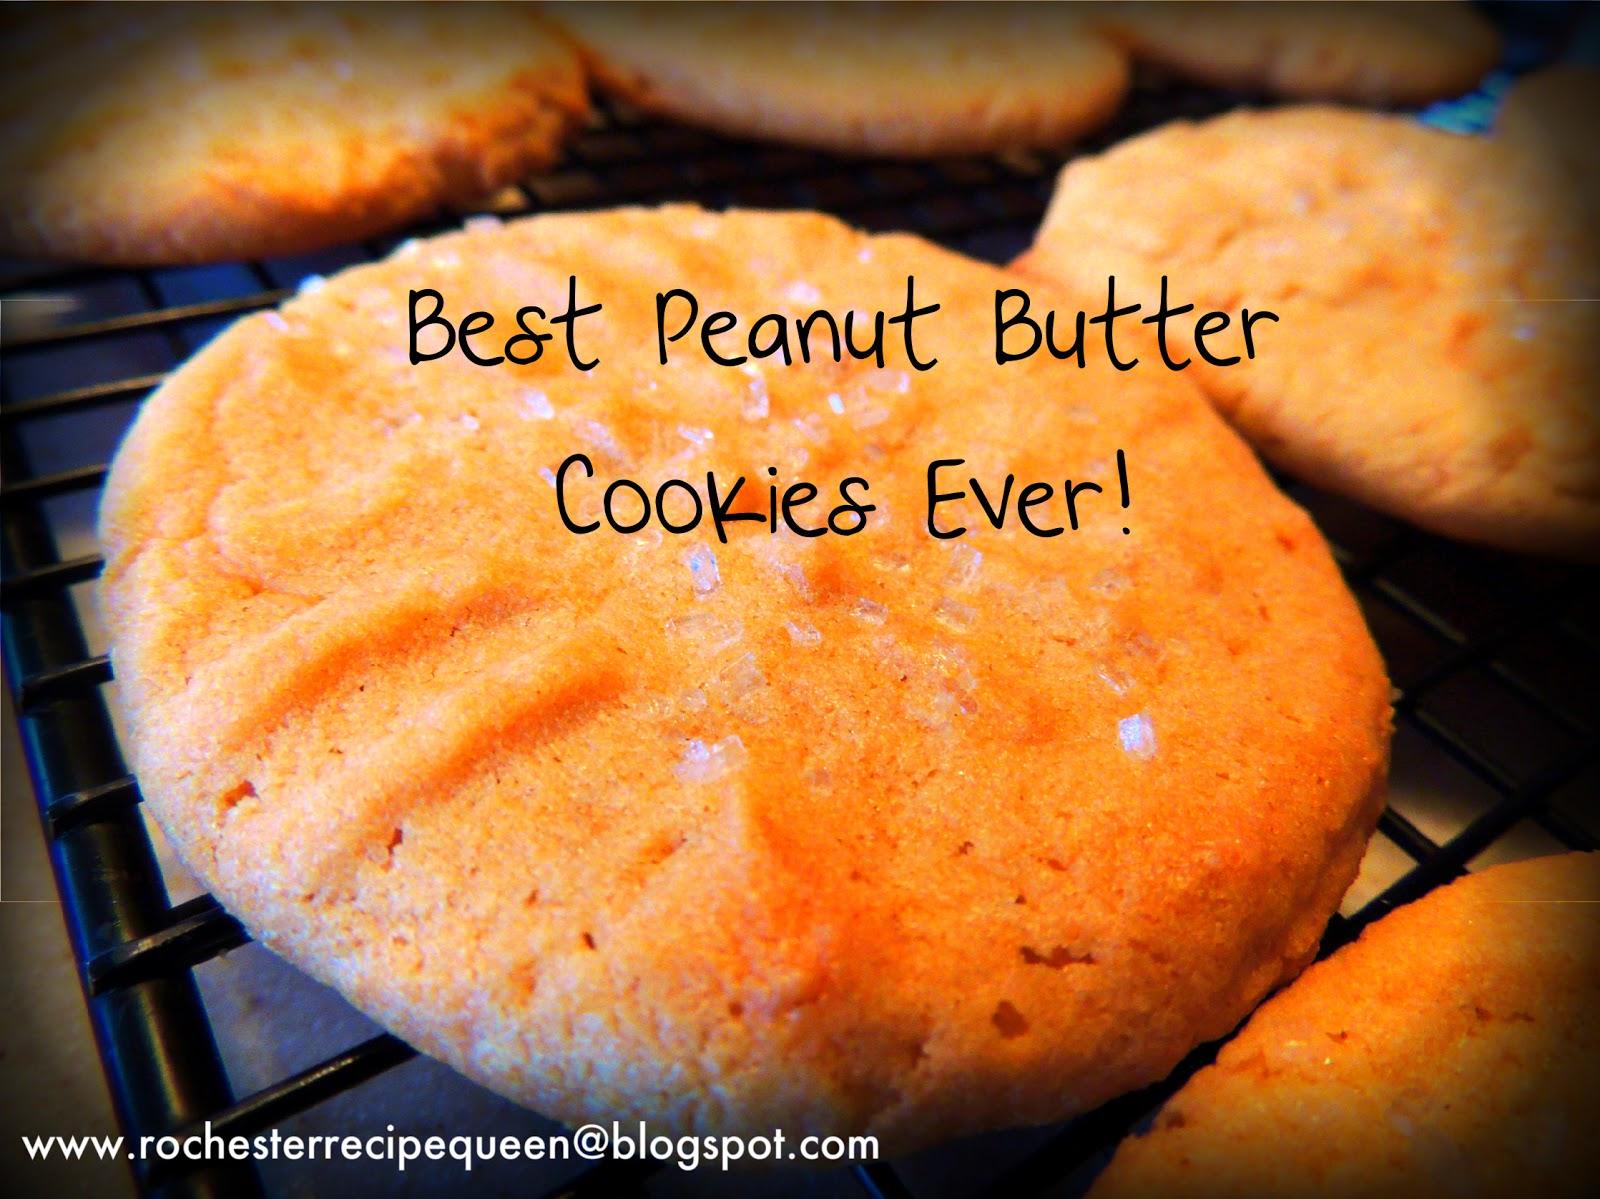 The Rochester Recipe Queen!: Best Peanut Butter Cookies Ever!